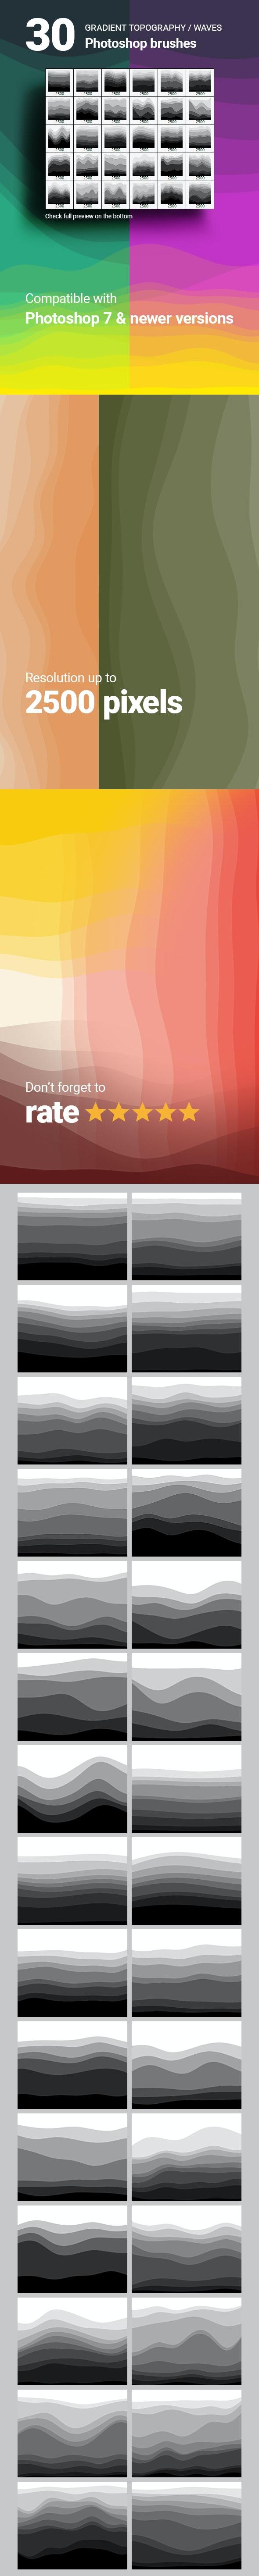 30 Topography Map Gradient Layered Waves Photoshop Brushes - Brushes Photoshop